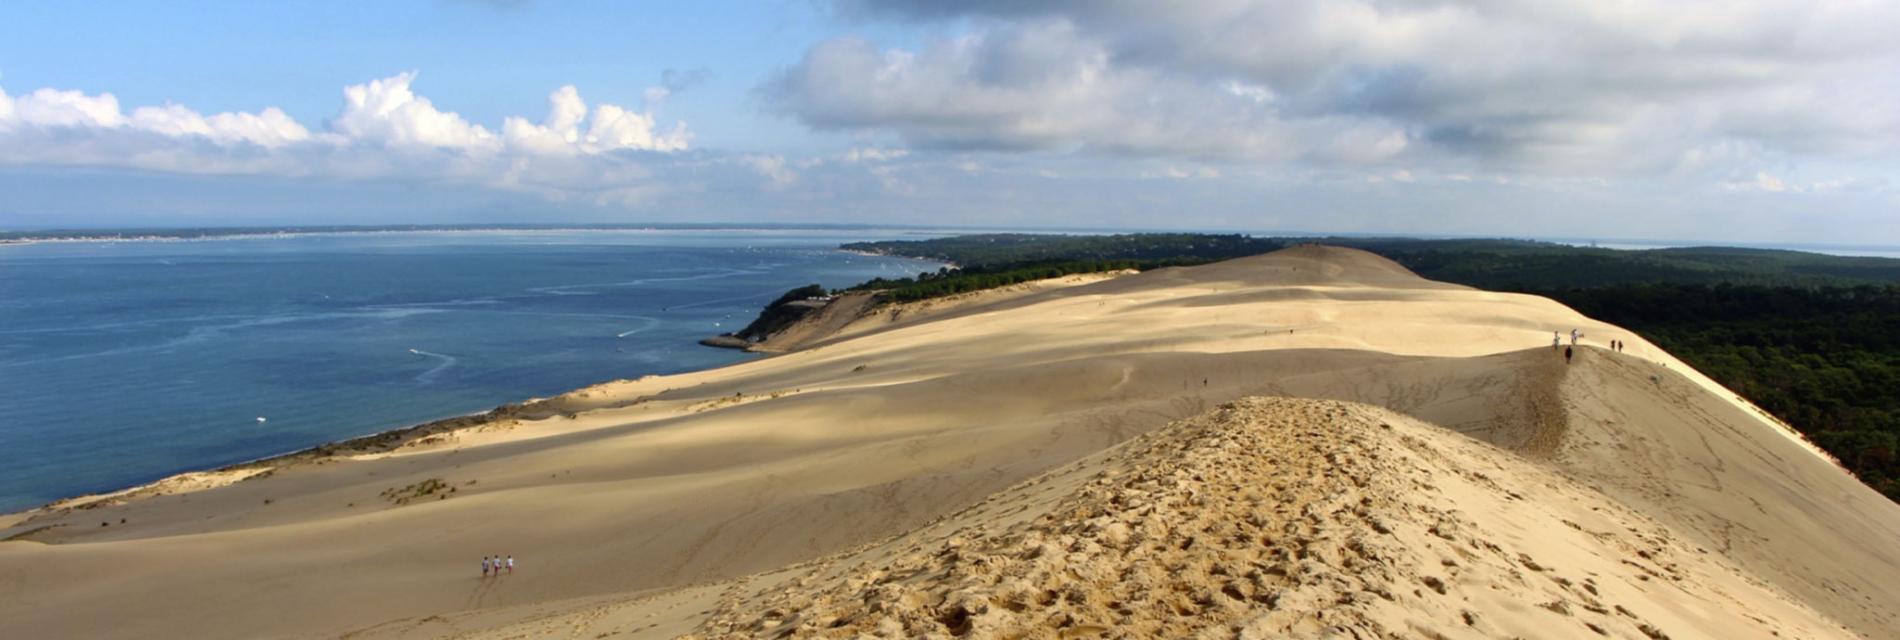 Slide La dune du Pyla